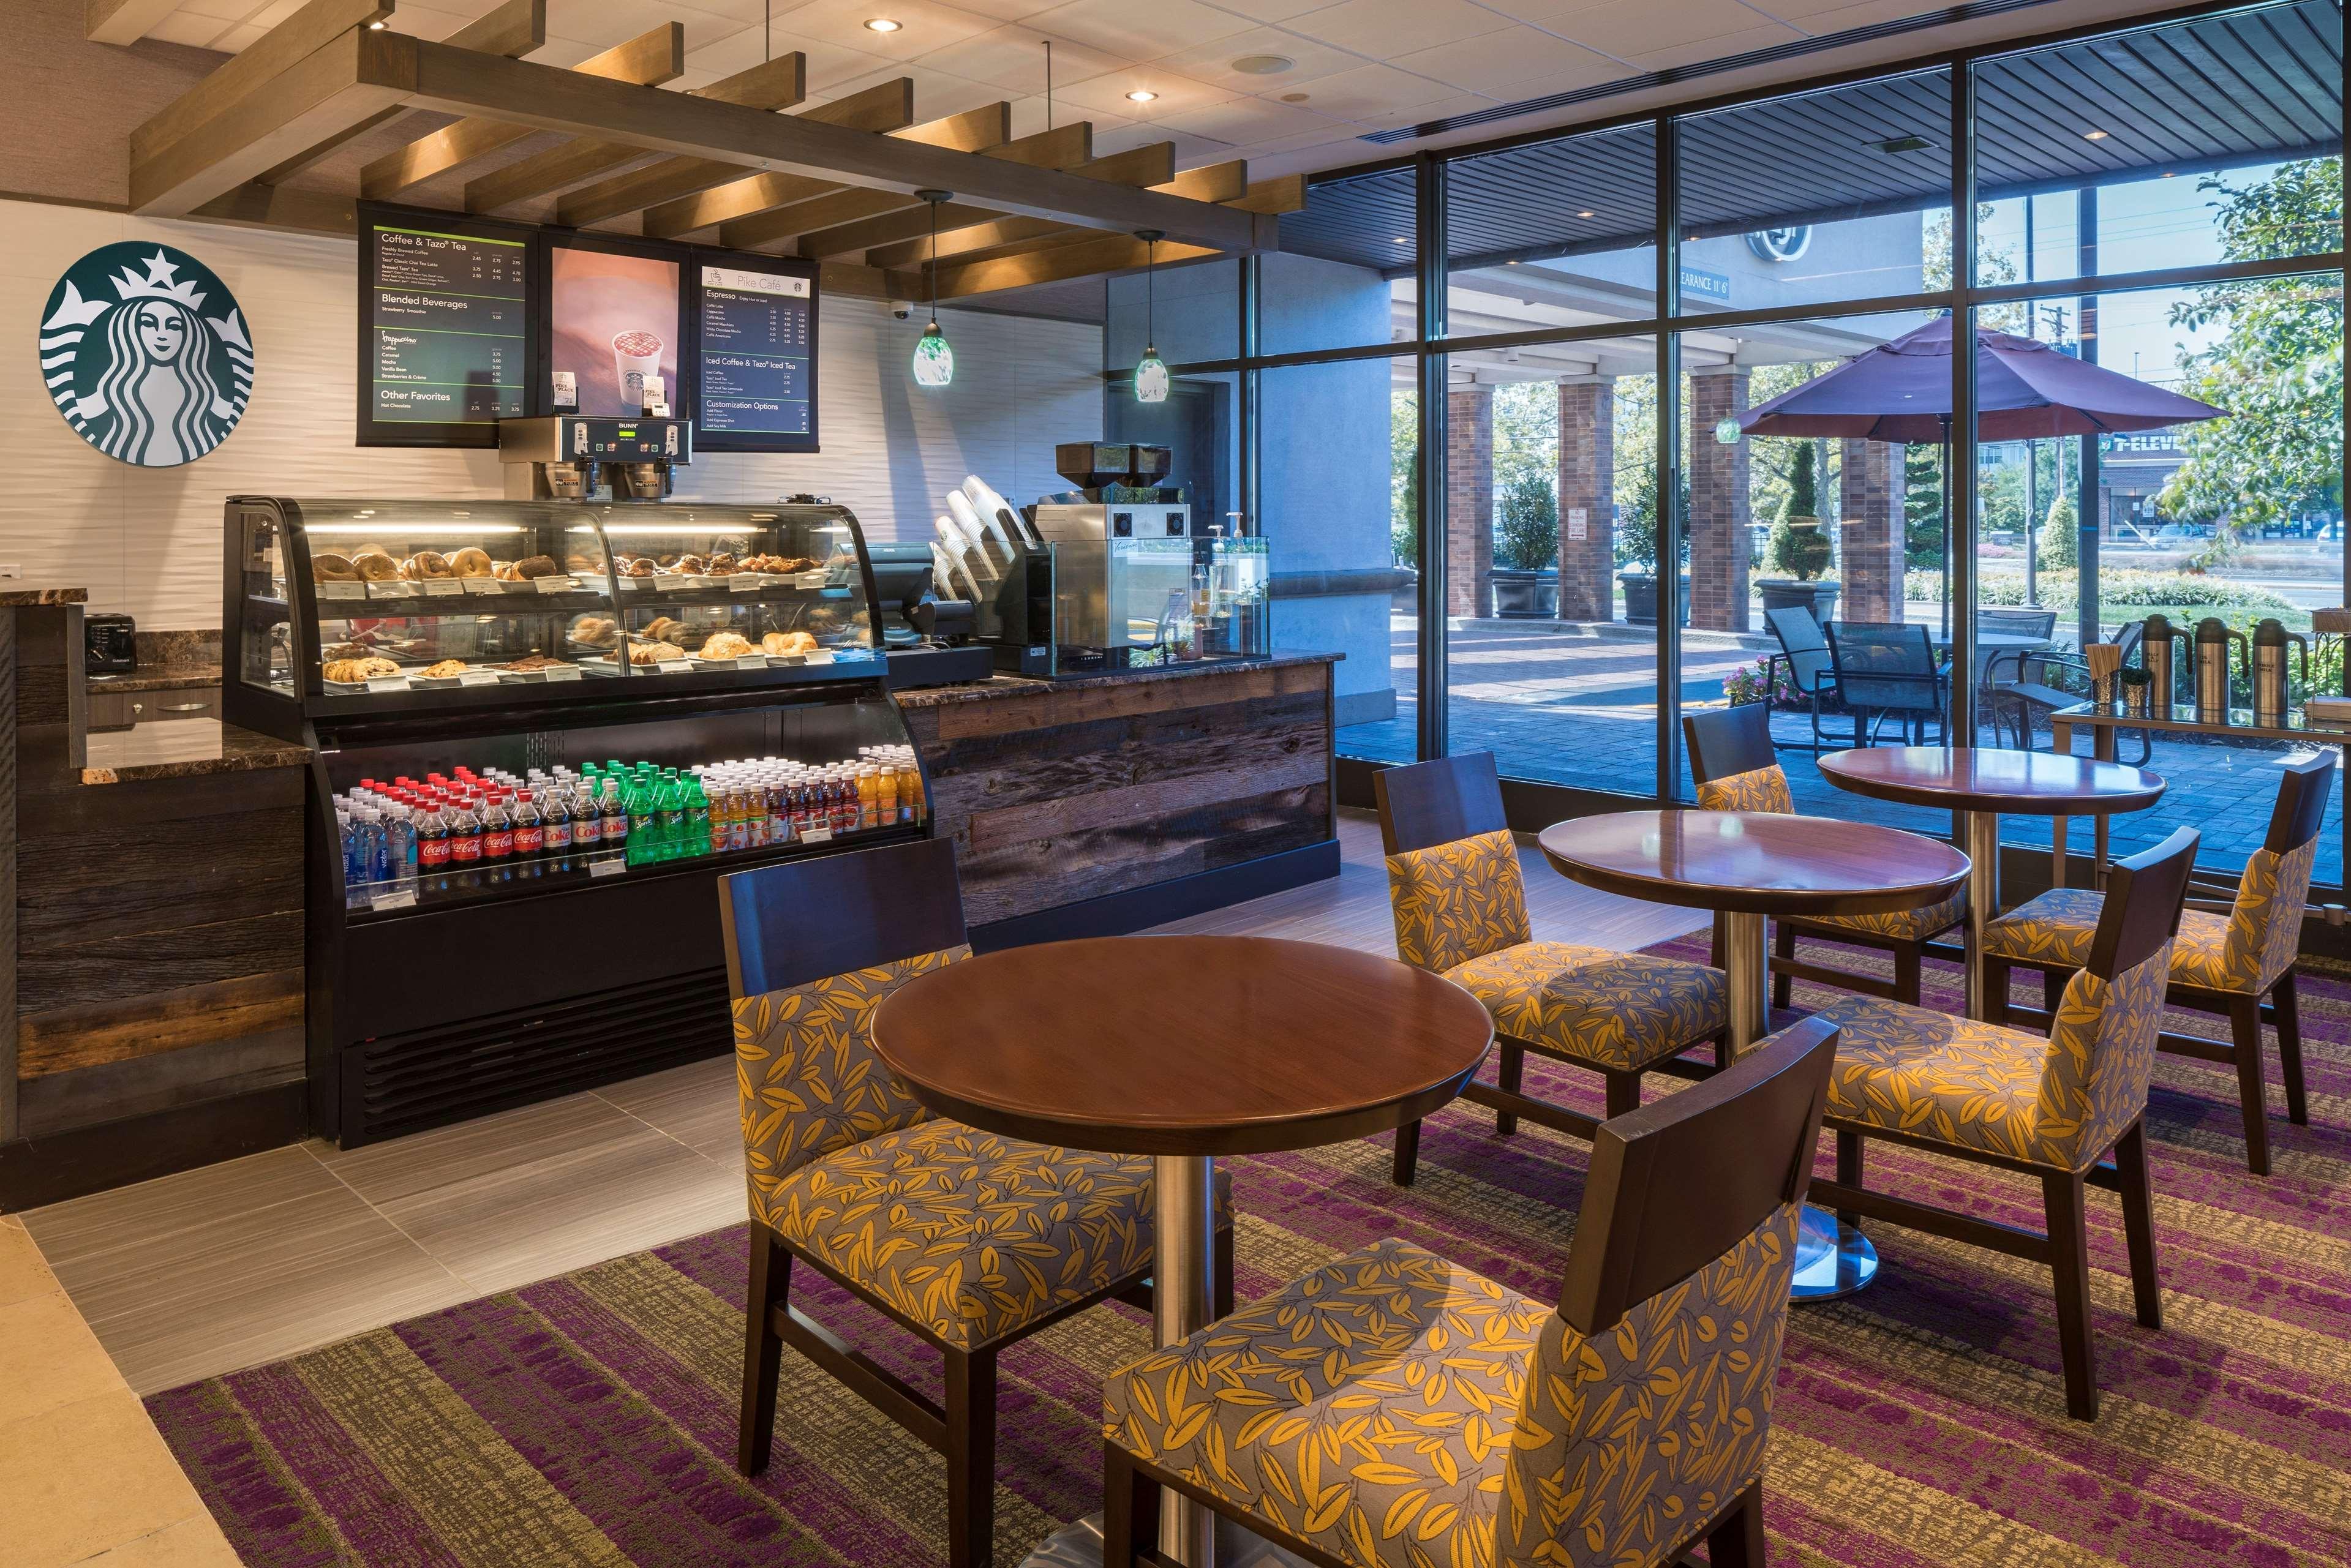 Hilton Washington DC/Rockville Hotel & Executive Meeting Ctr image 27